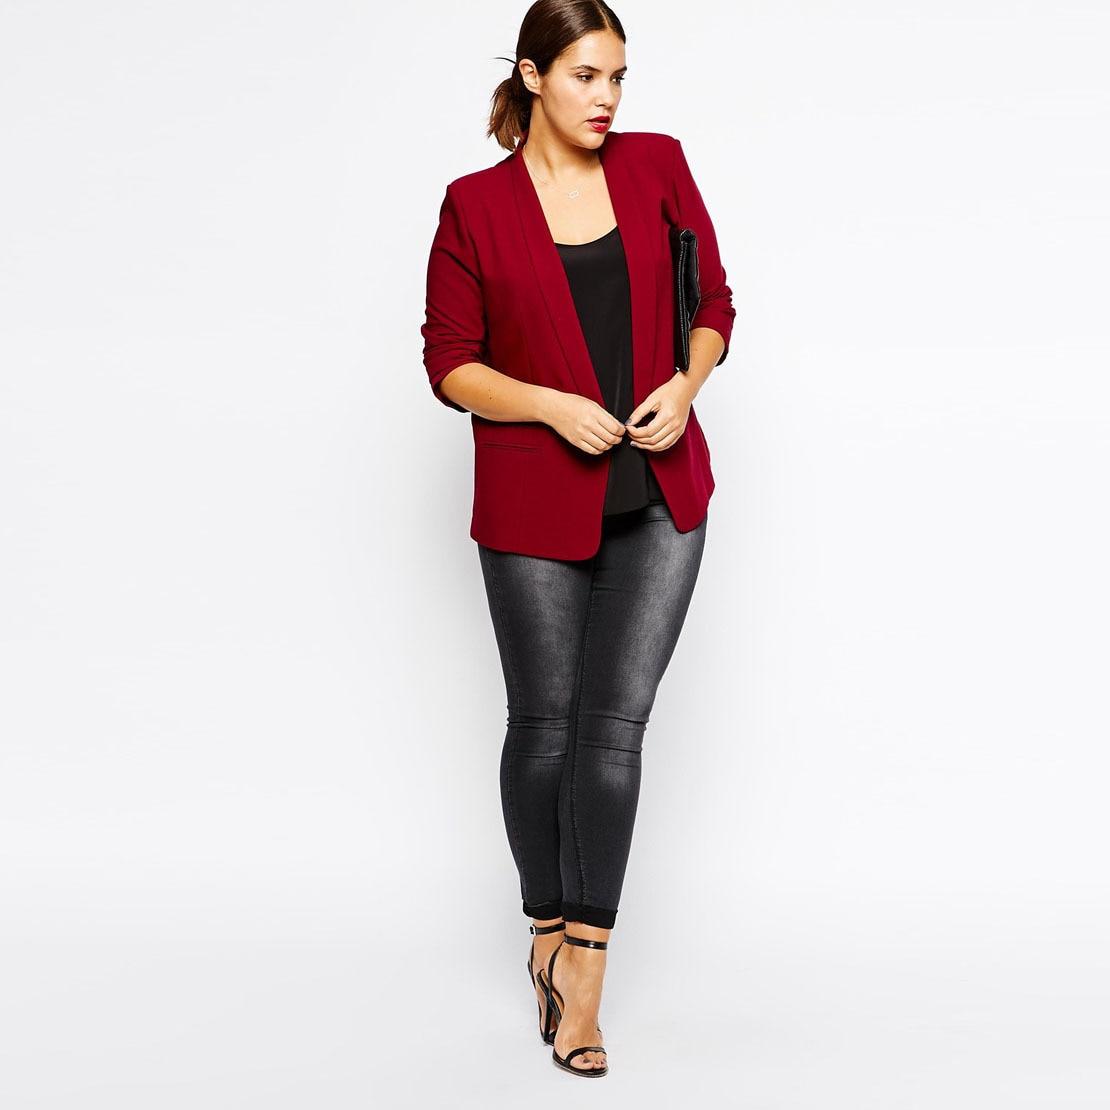 Blazer Women Plus Size Slim Black Red Autumn